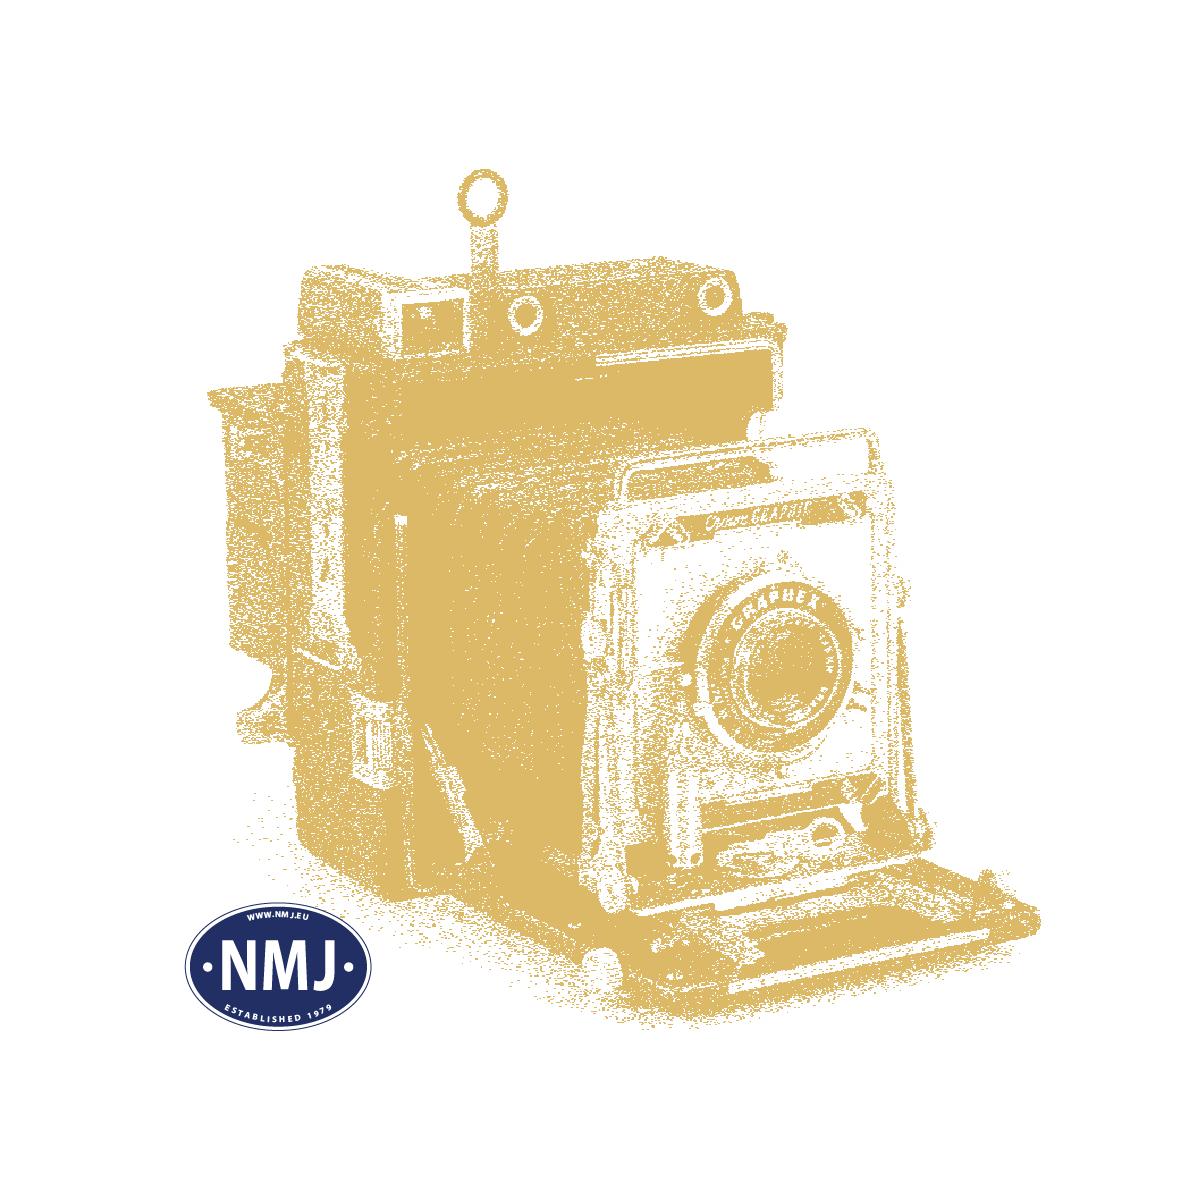 NMJT84.203 - NMJ Topline NSB BM69A.06, rot/schwarz, DC